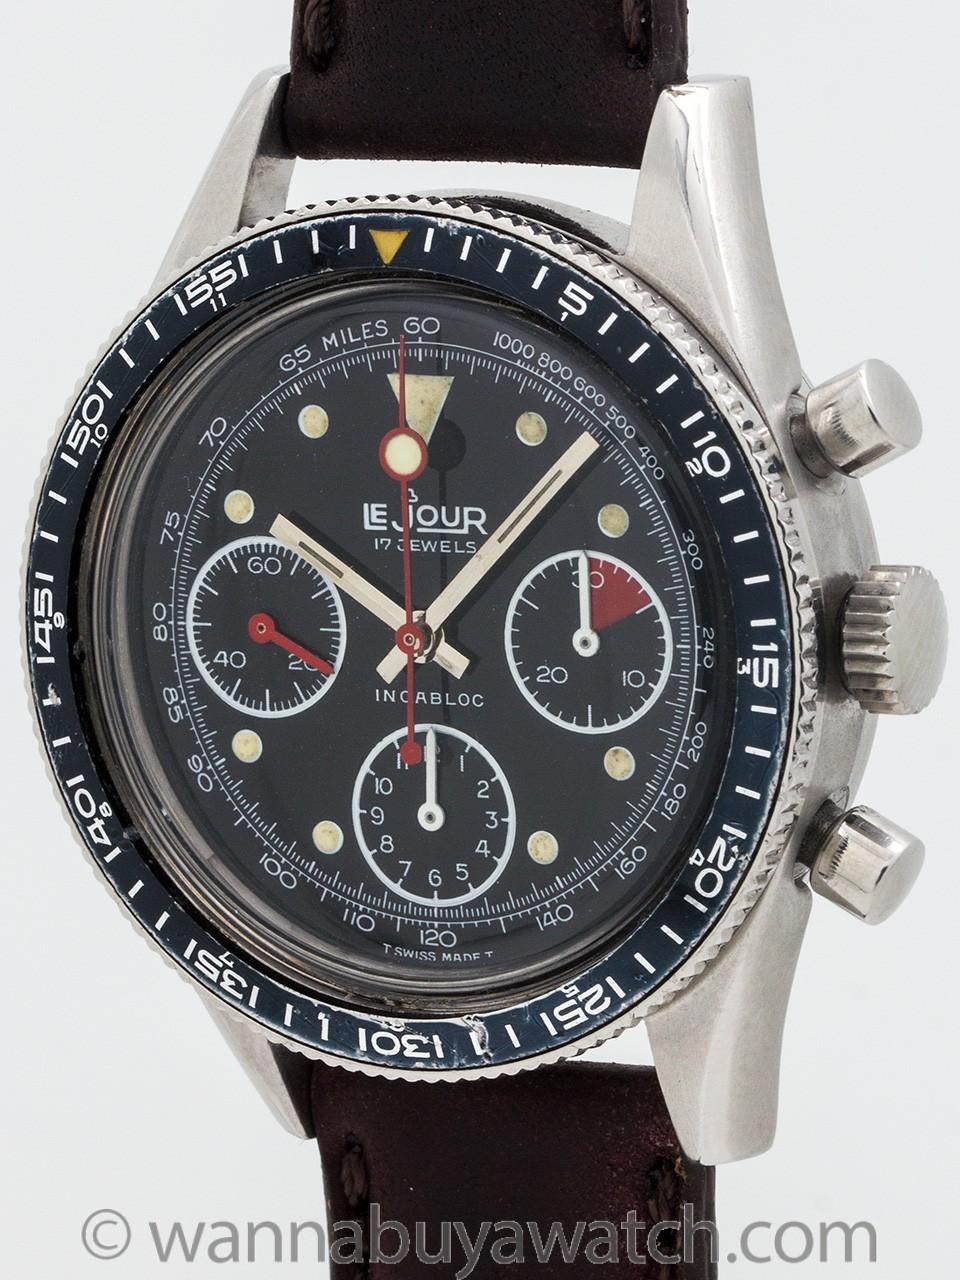 Lejour Chronograph 3 Registers Valjoux 7336 circa 1960